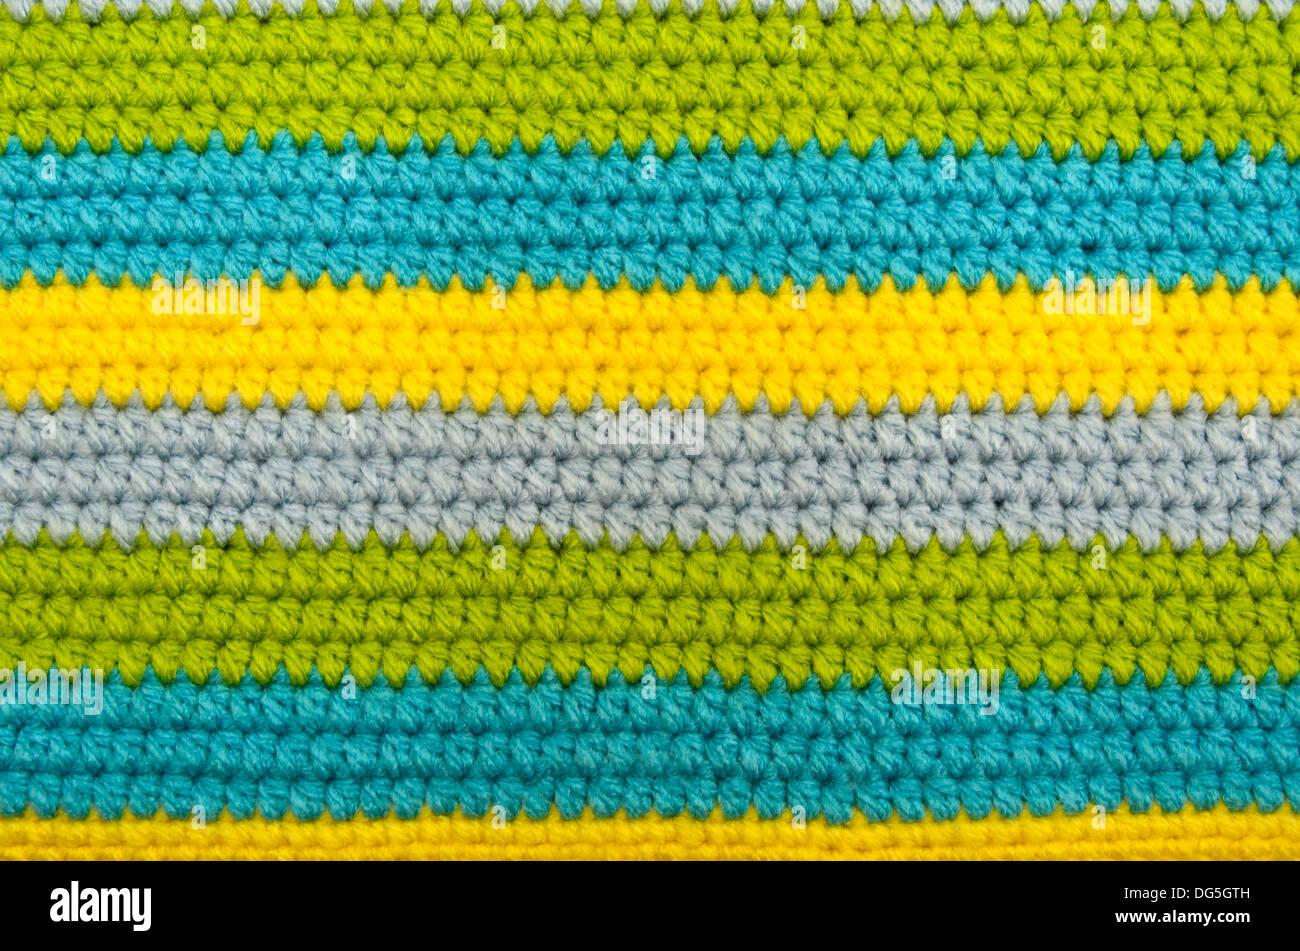 Crochet pattern closed up - Stock Image